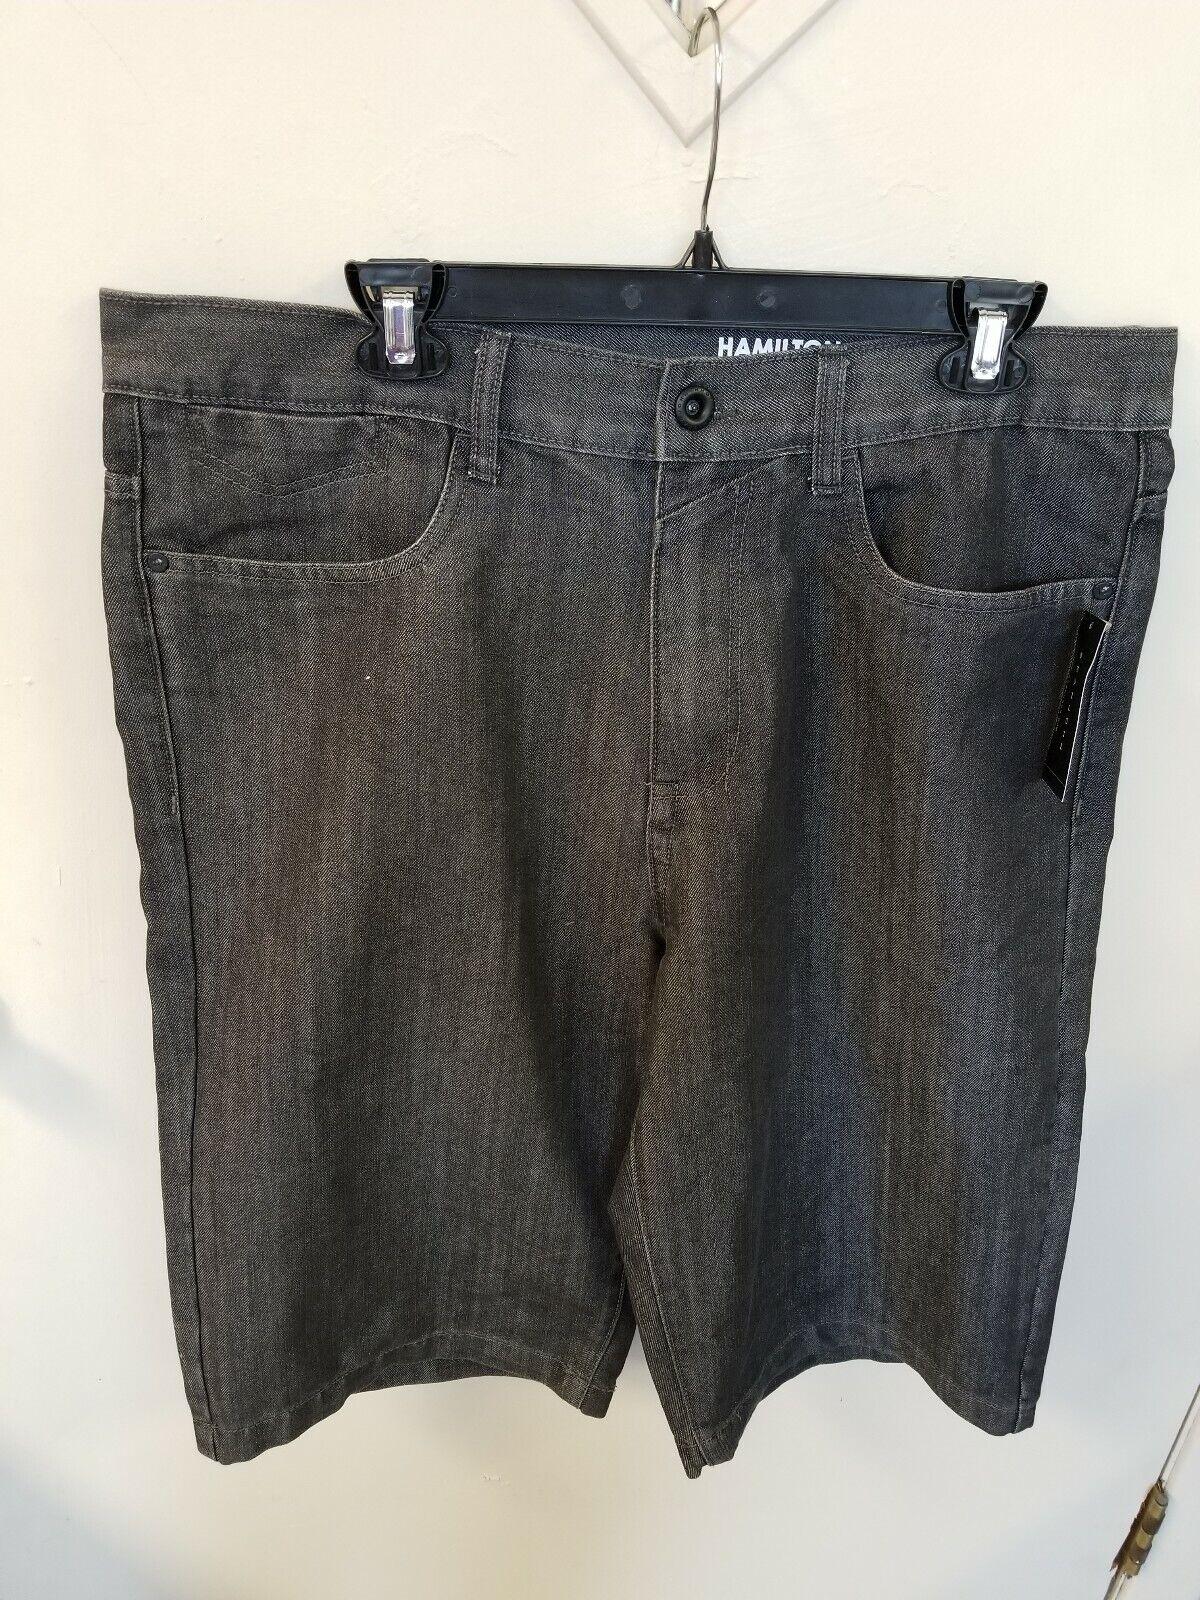 SEAN JOHN- HAMILTON,  Classic Relaxed Fit Grey Jeans  Men's Sizes 30 34, 36...